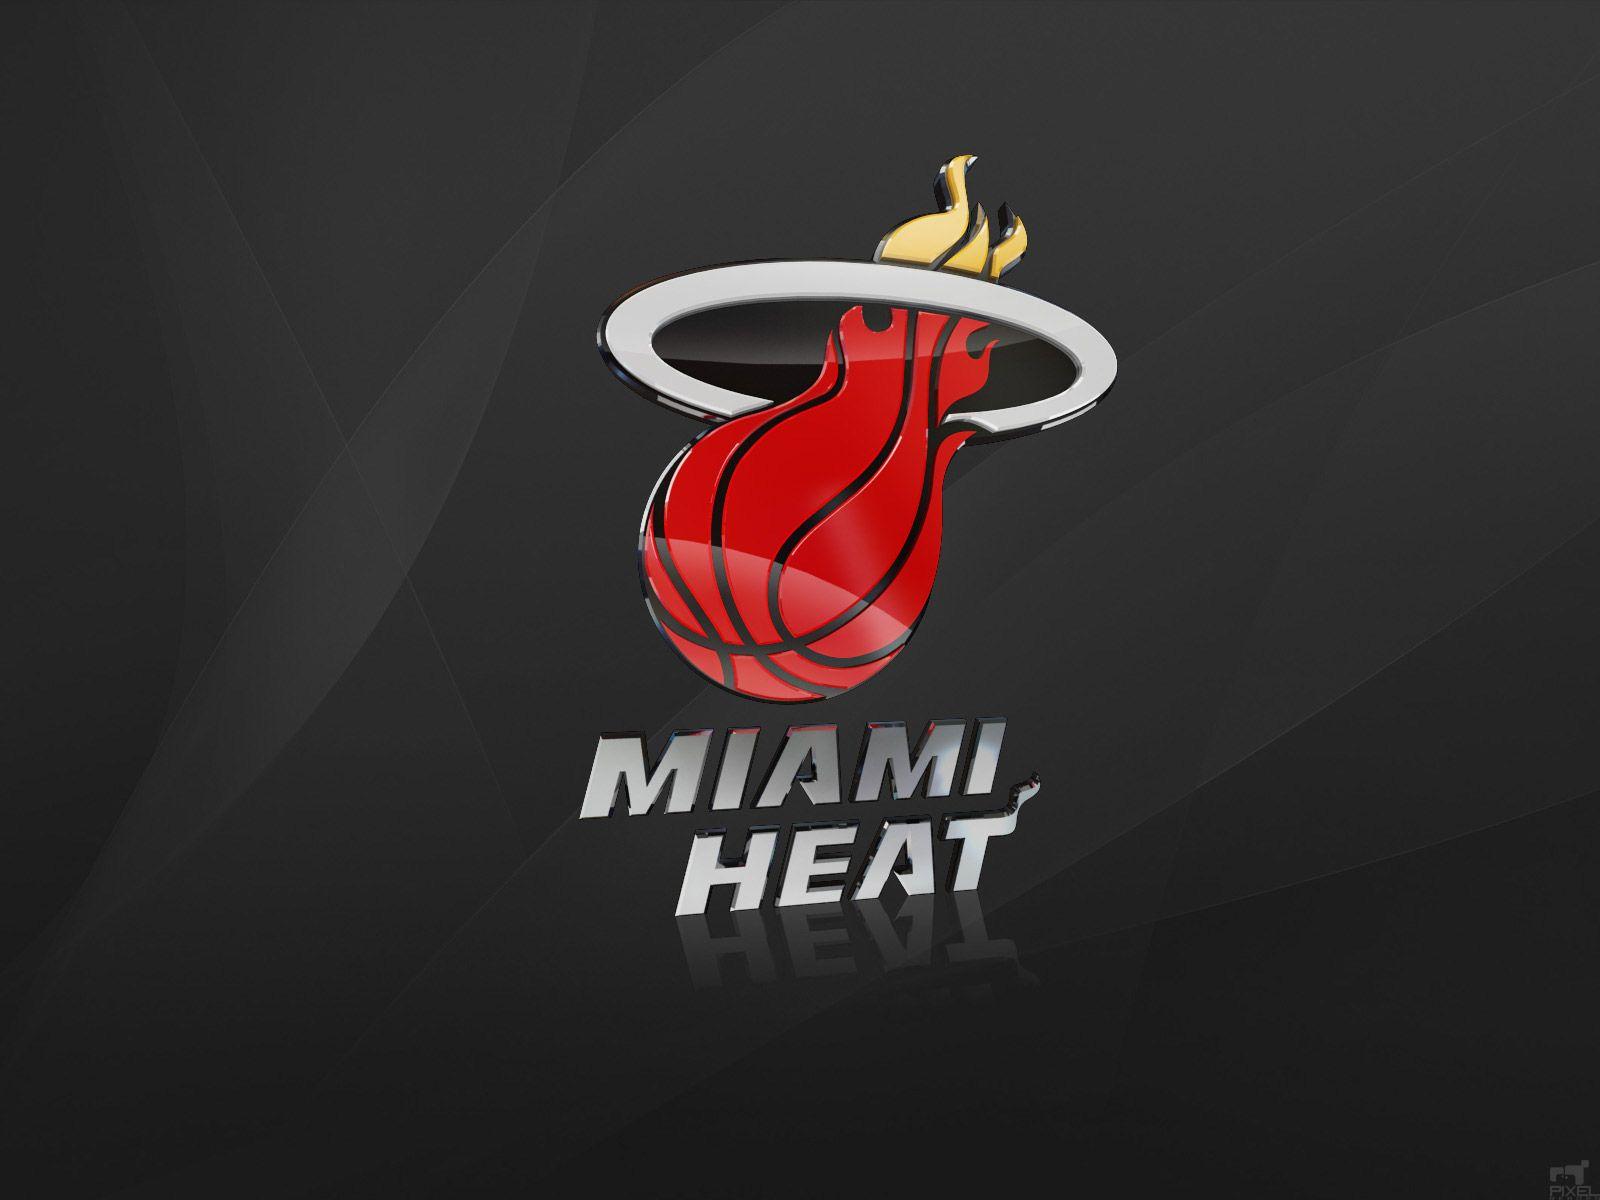 Miami Heat Logo Wallpapers 2015 1600x1200